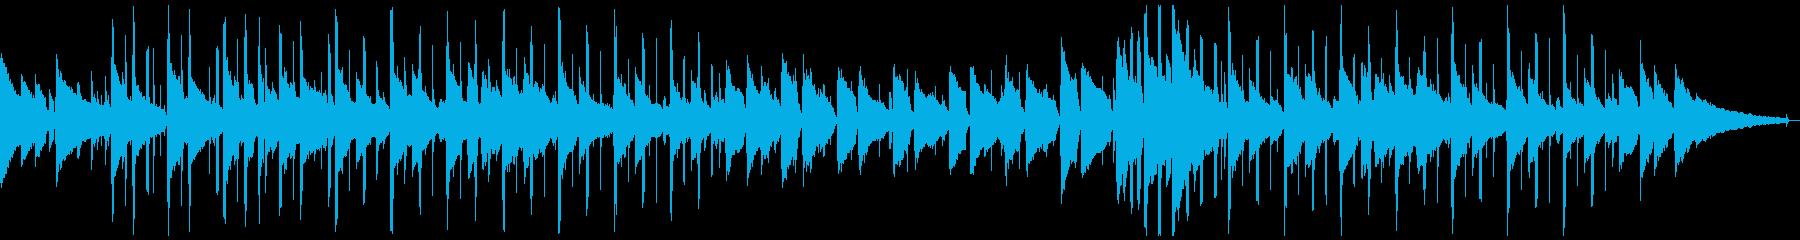 BGM 孤独感・静けさのある場面の再生済みの波形